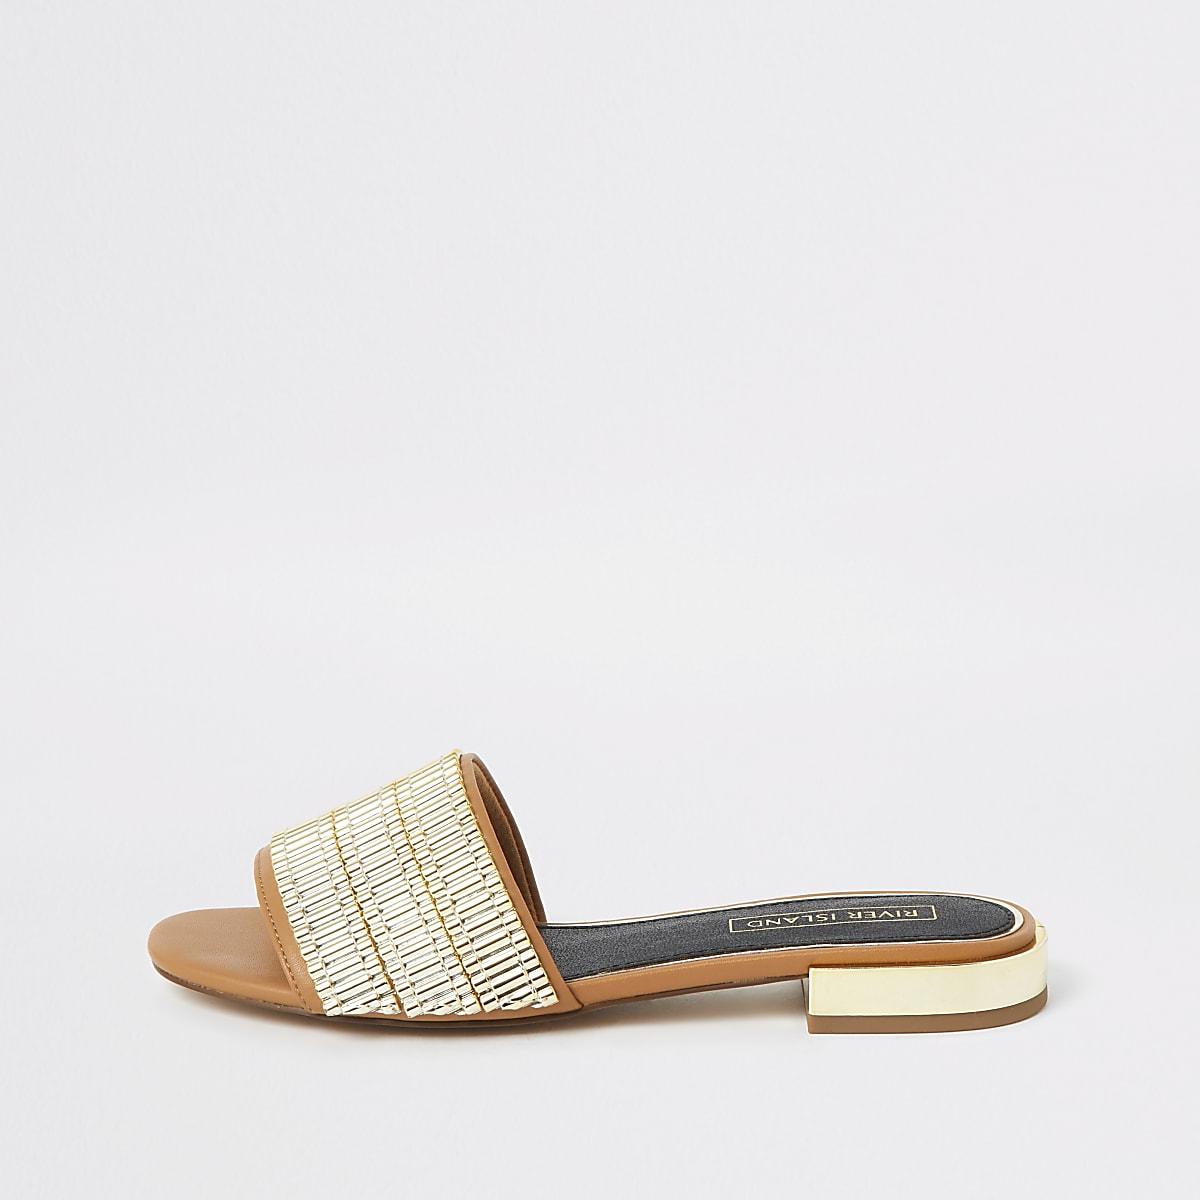 Bruine verfraaide sandalen